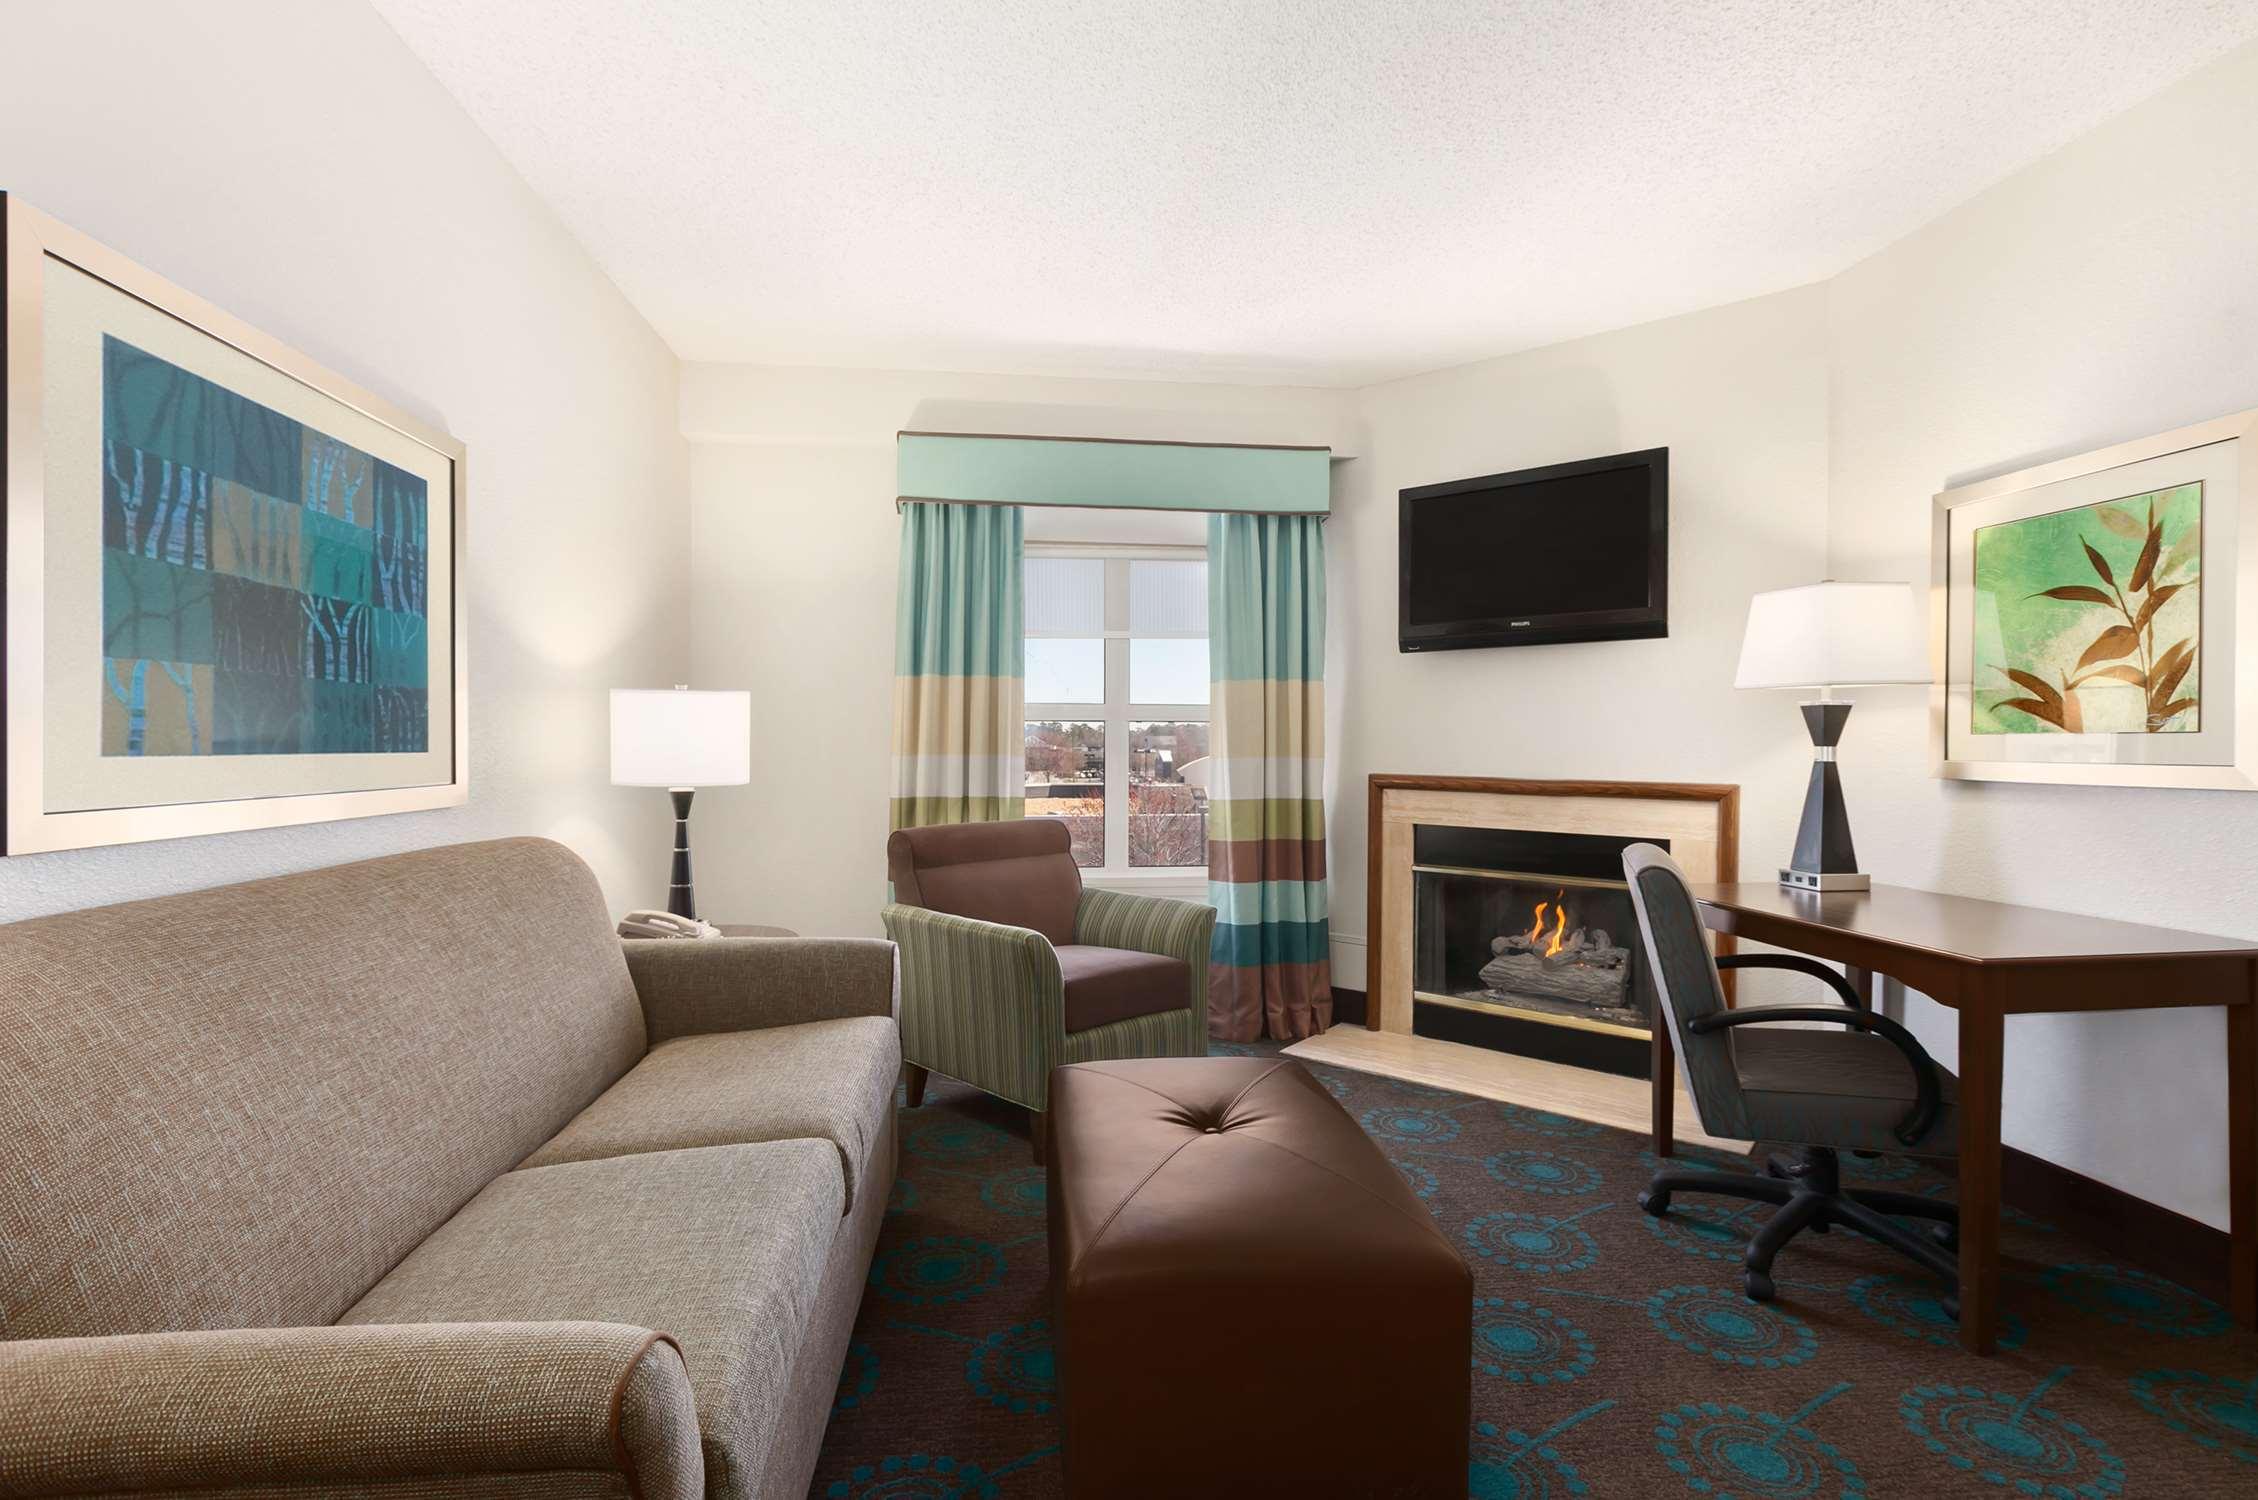 Hampton Inn & Suites Newport News (Oyster Point) image 13